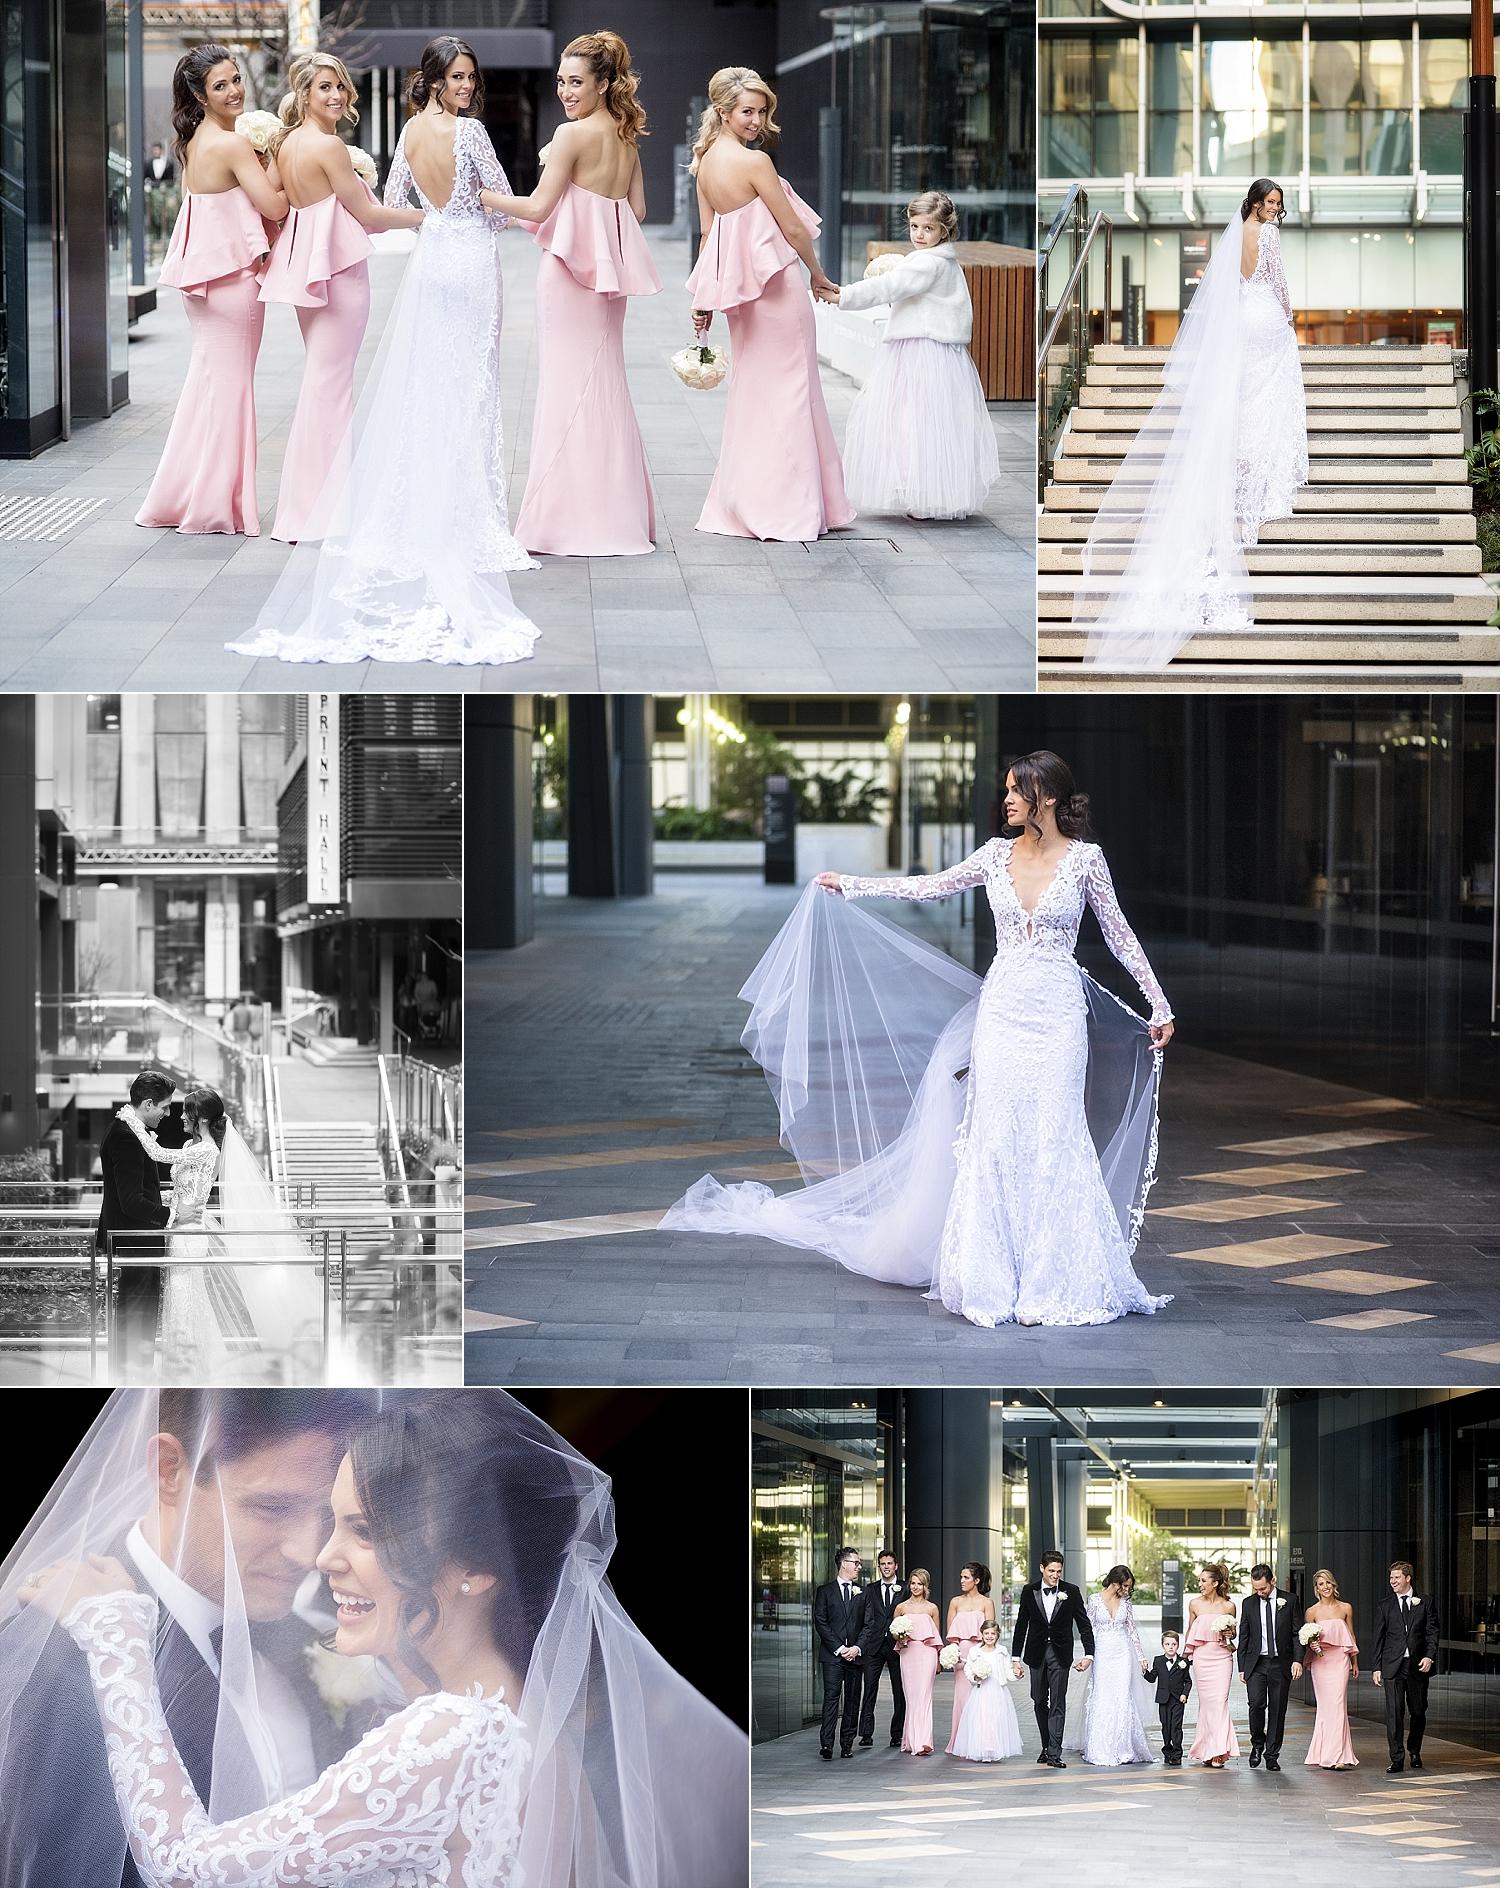 Brookfield Place wedding photos Perth.jpg